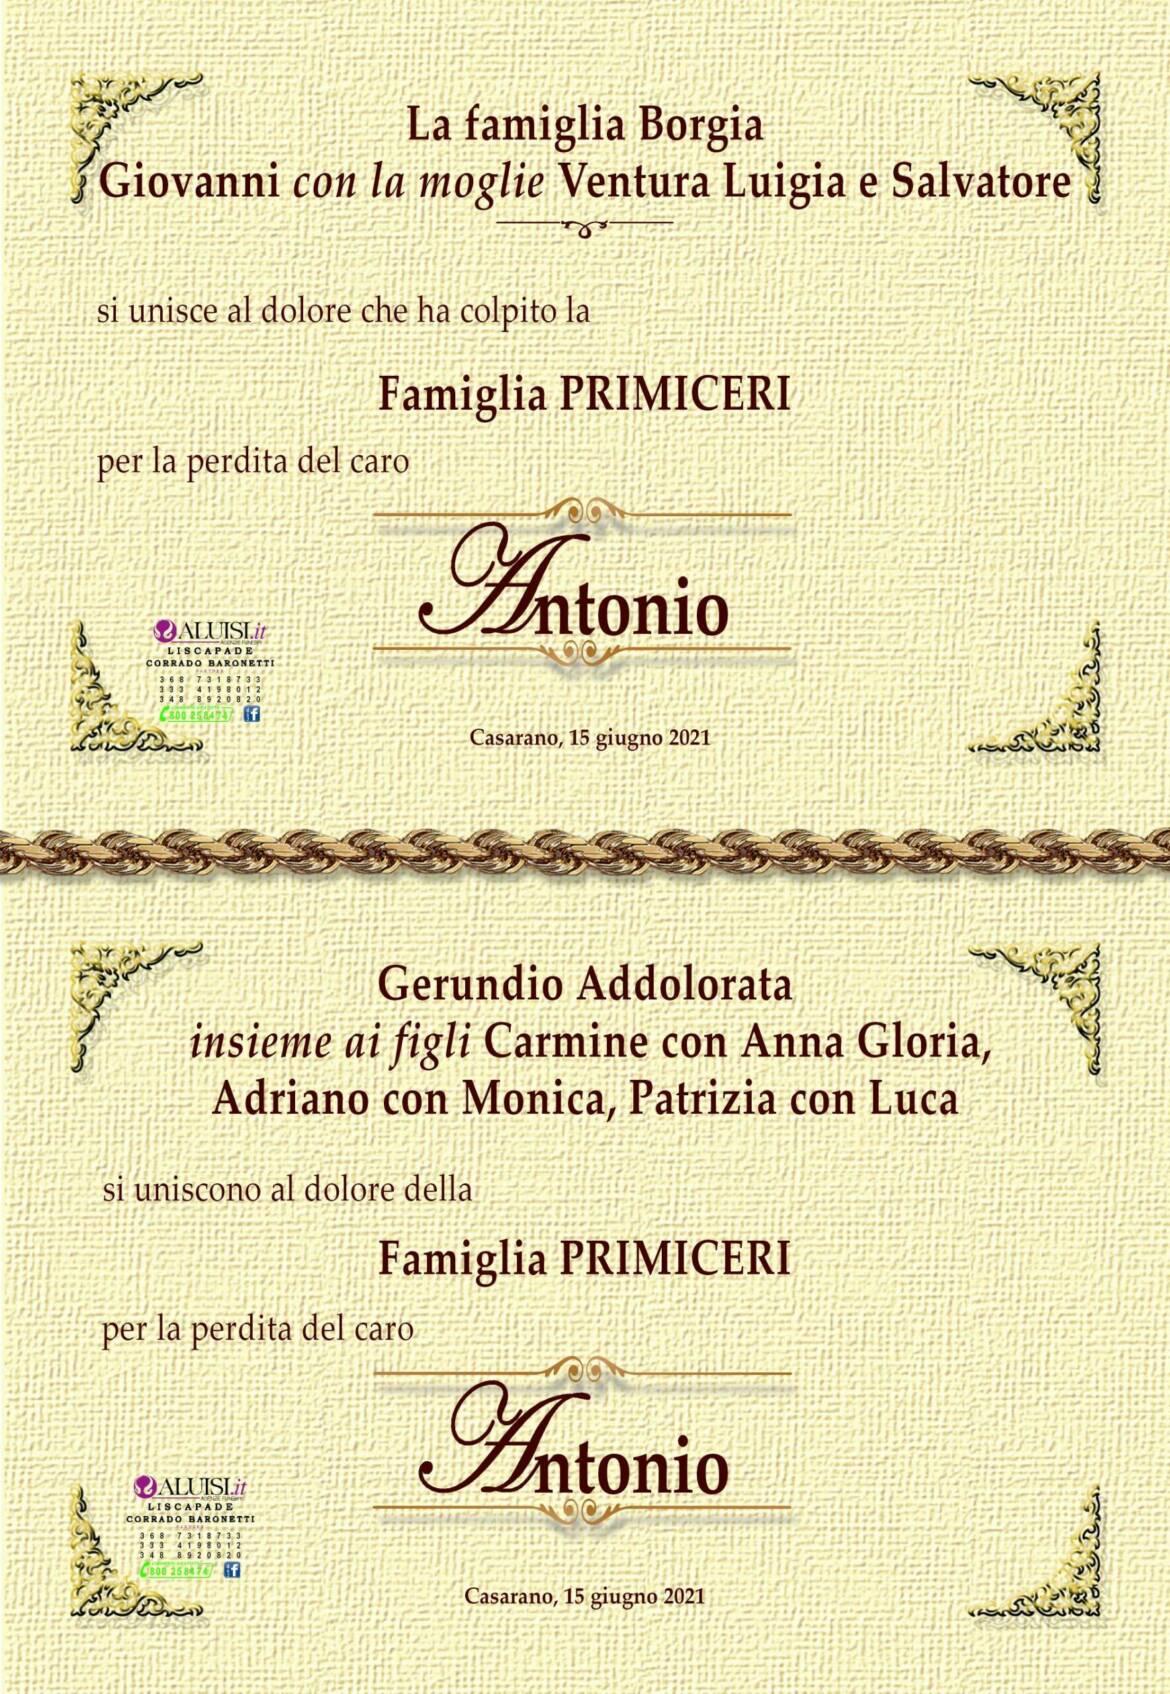 PARTECIPAZIONIe-antonio-casarano-2-scaled.jpg